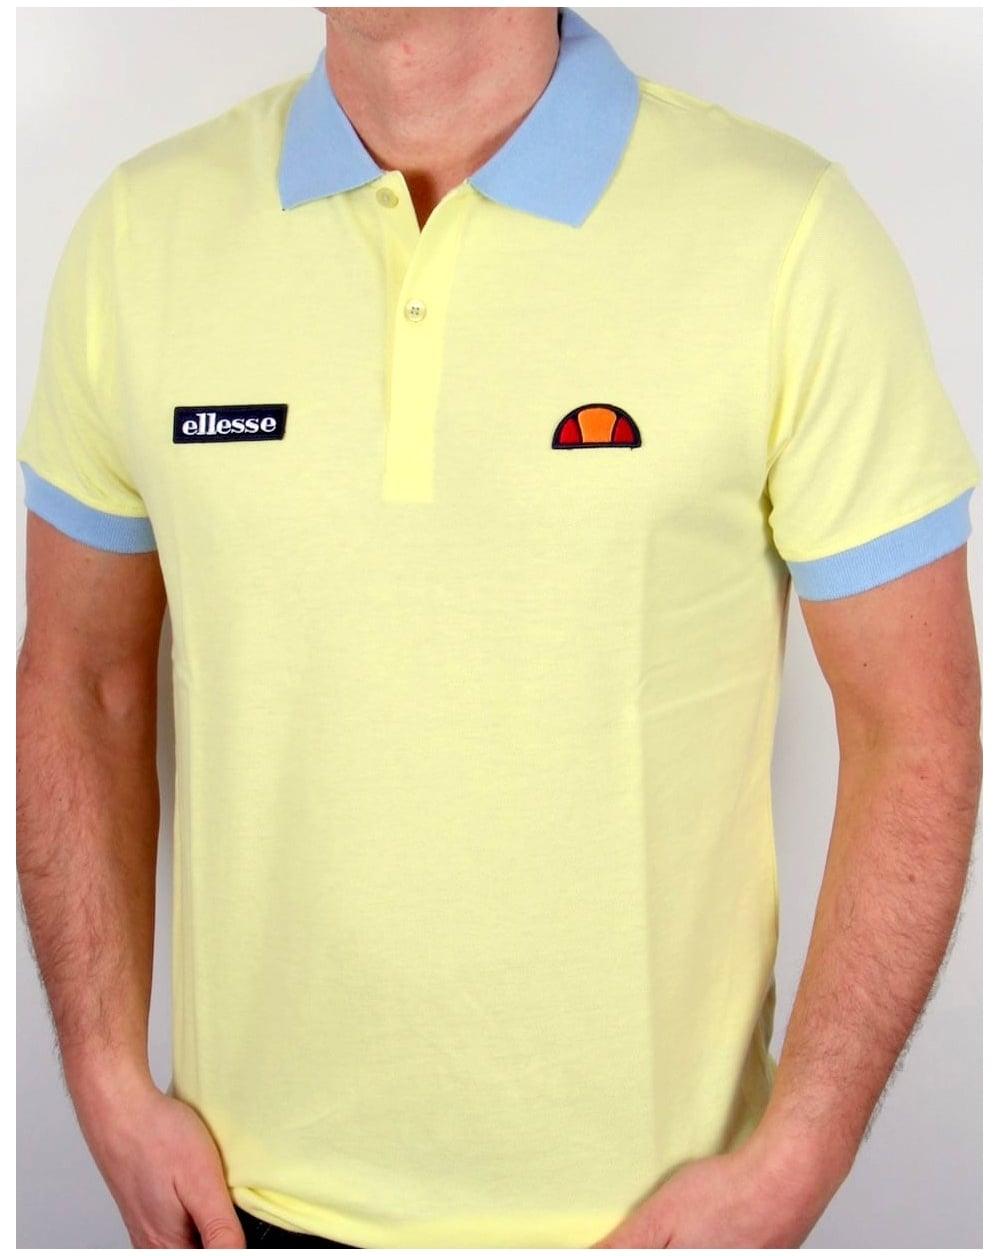 e2140ccb71 Ellesse 80s Collar Polo Shirt Lemon/Sky